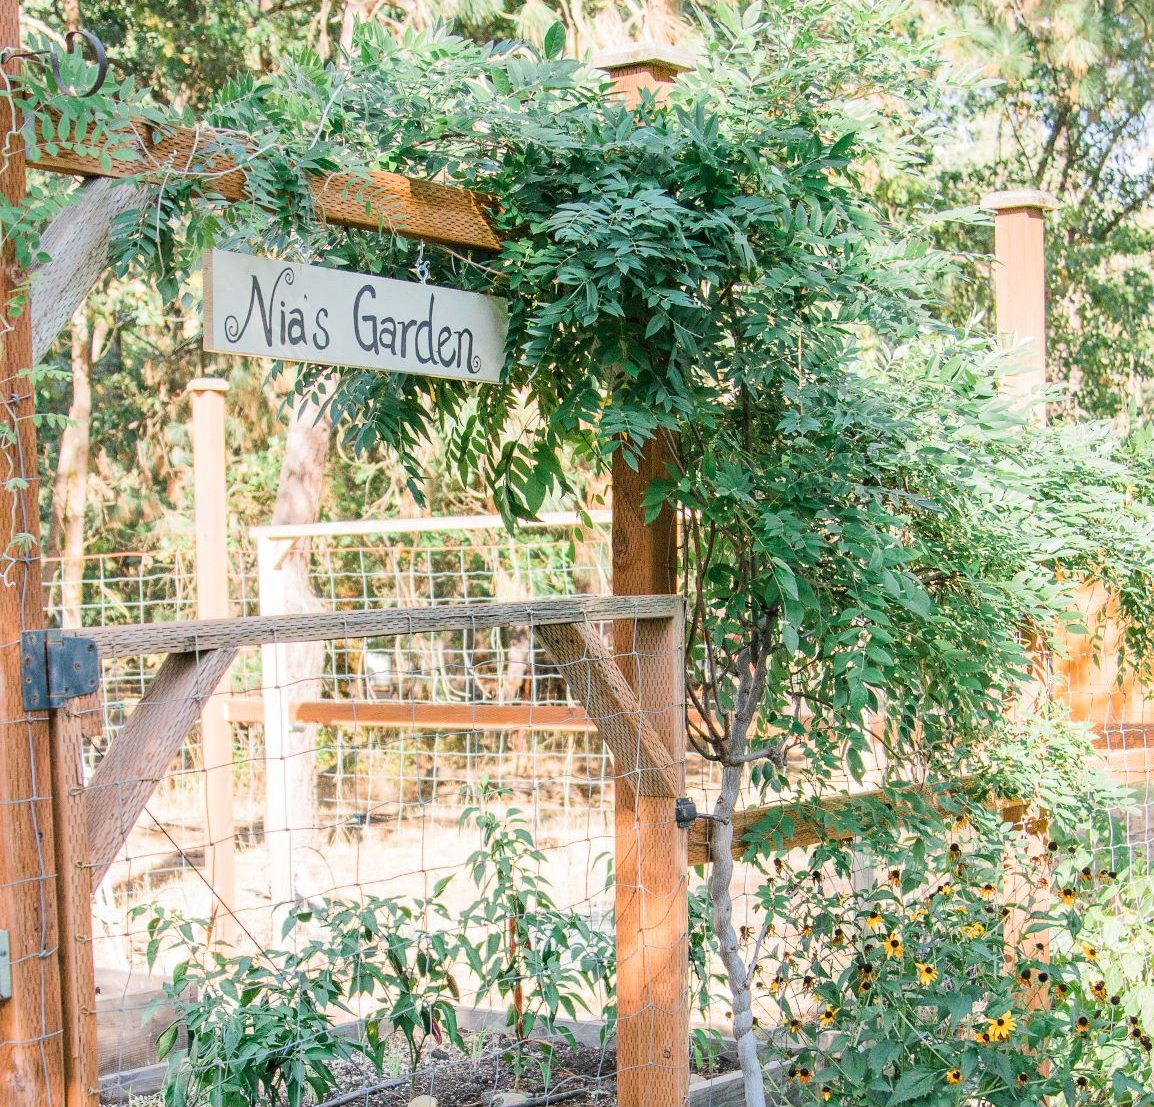 Nia's Harvest Gardens